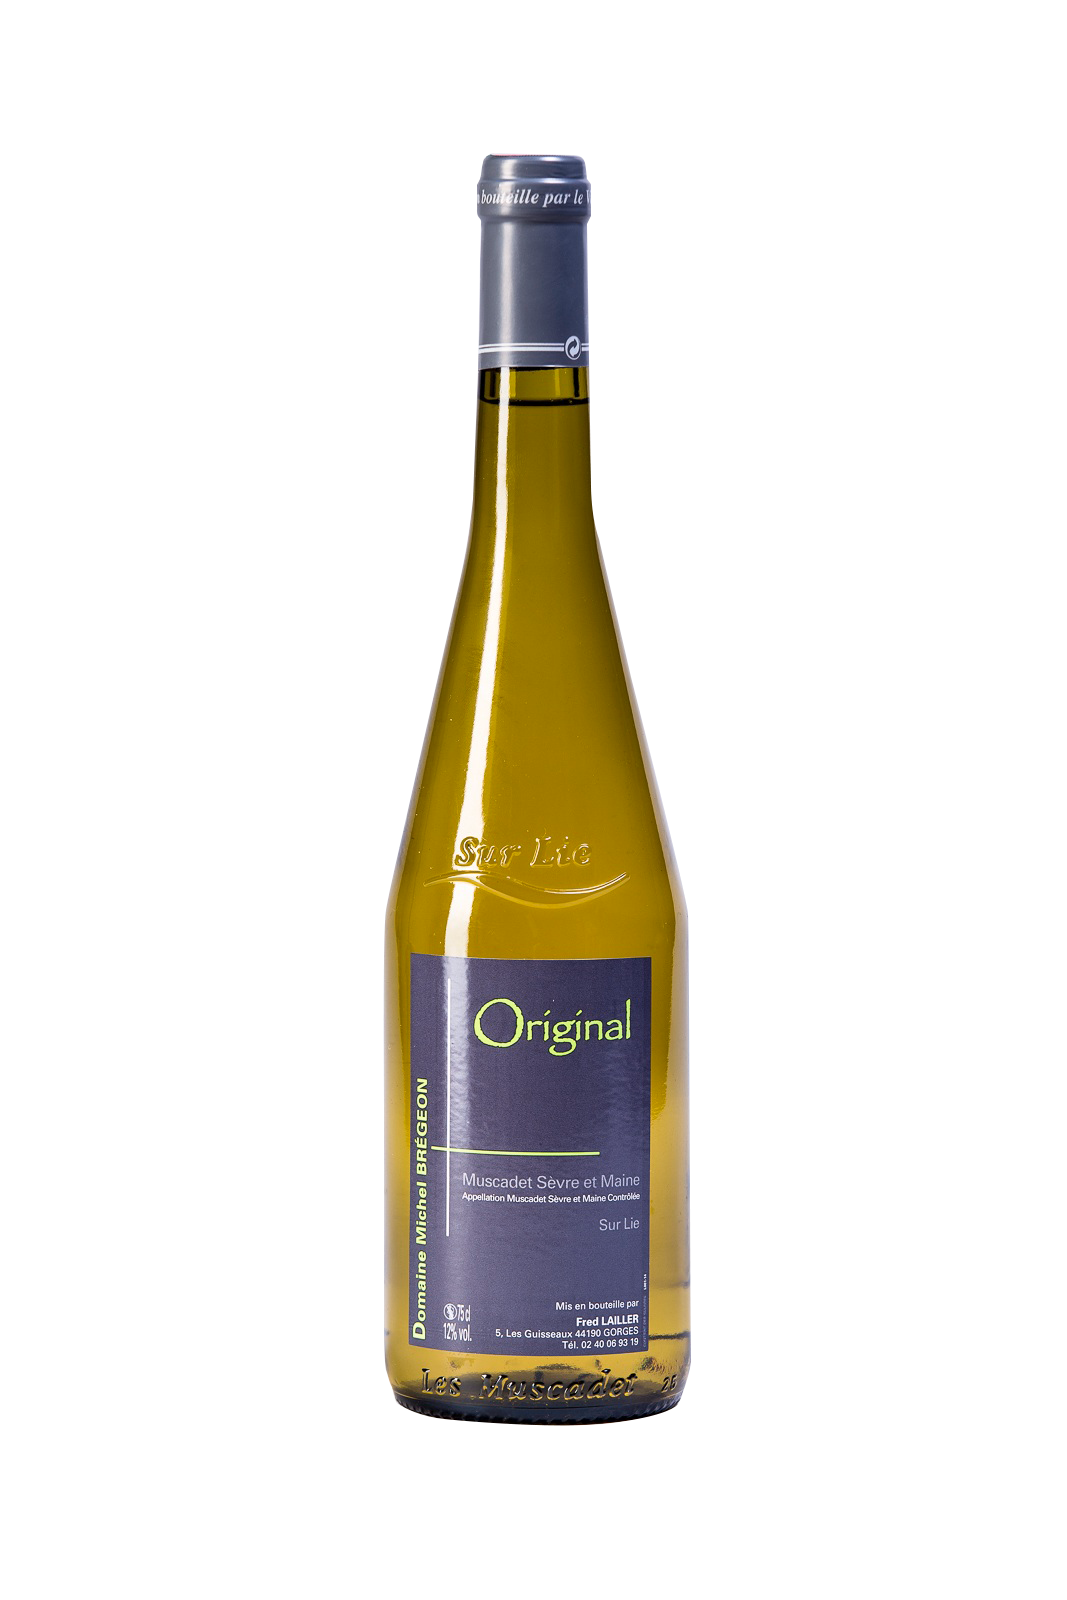 Original Muscadet Sèvre et Maine